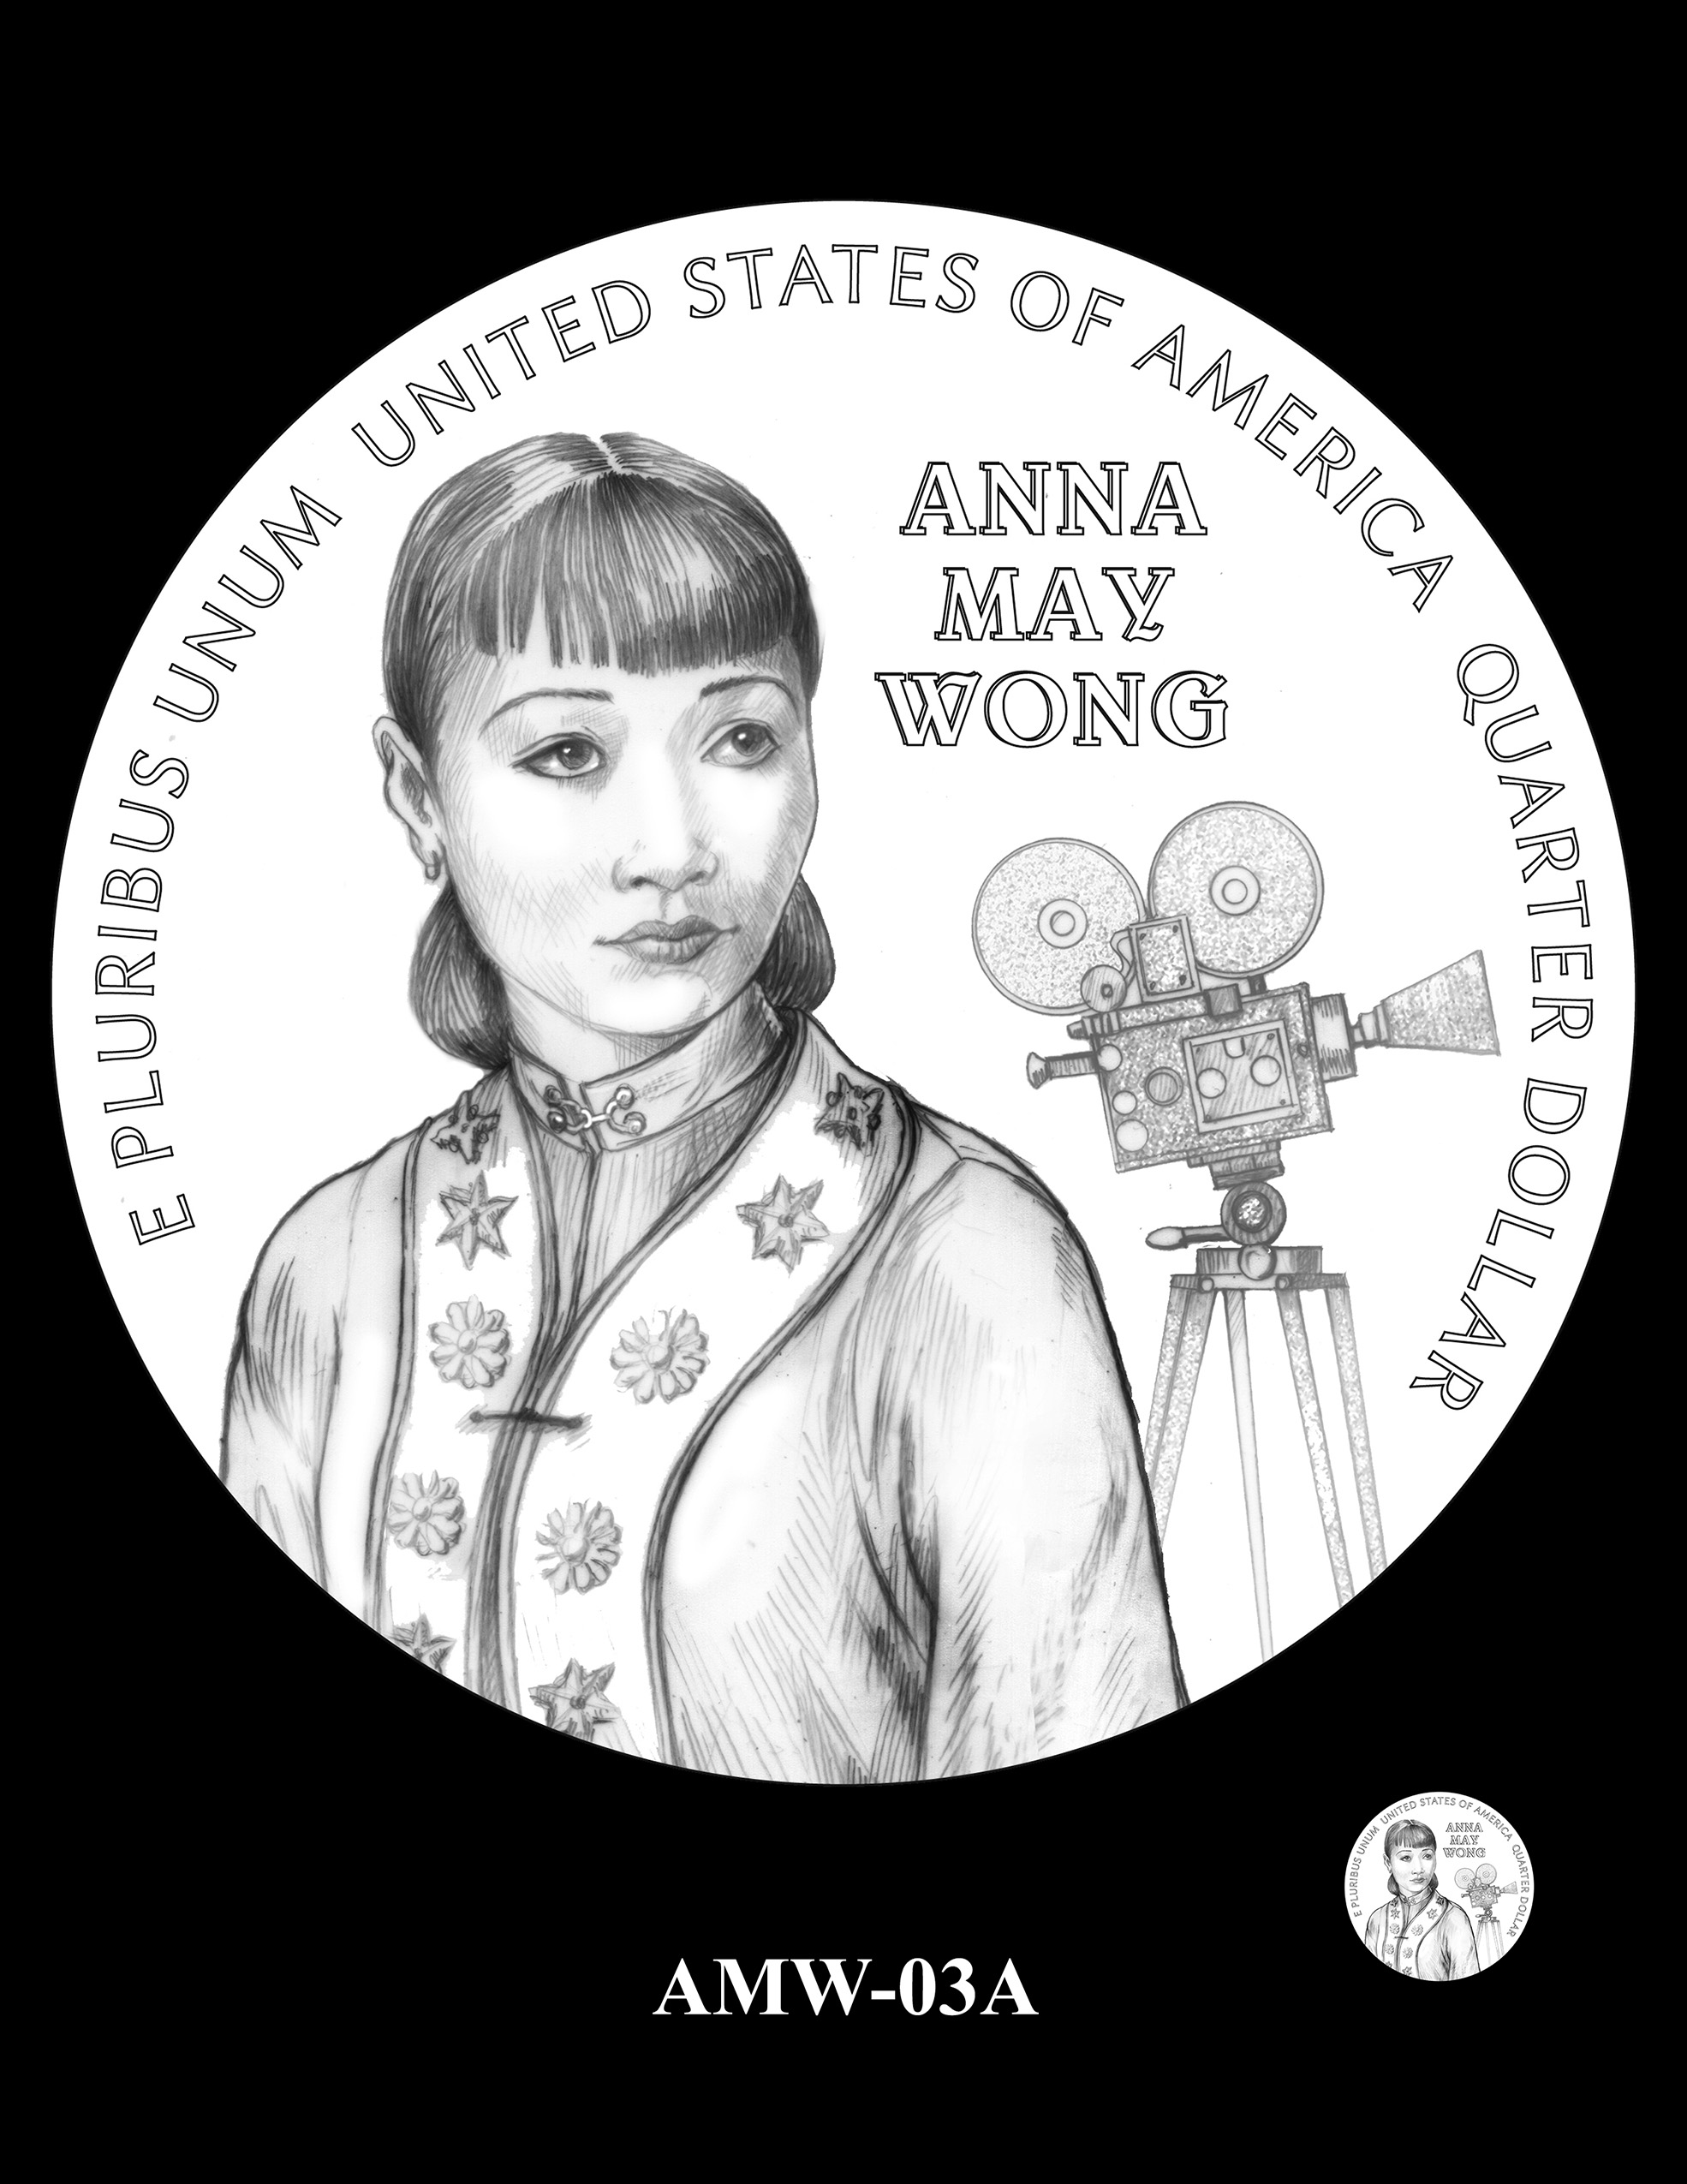 AMW-03A -- 2022 American Women Quarters - Anna May Wong